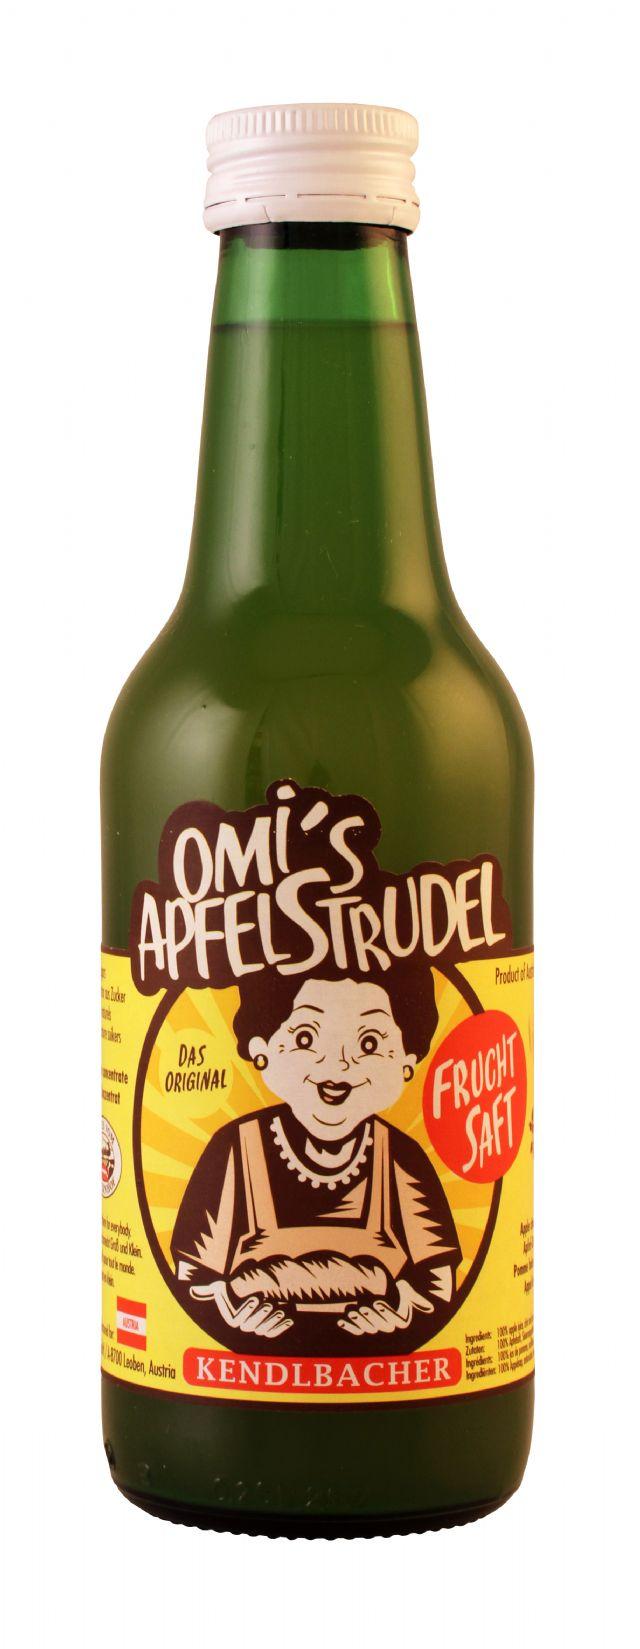 Omi's ApfelStrudel: OmisApfel Front